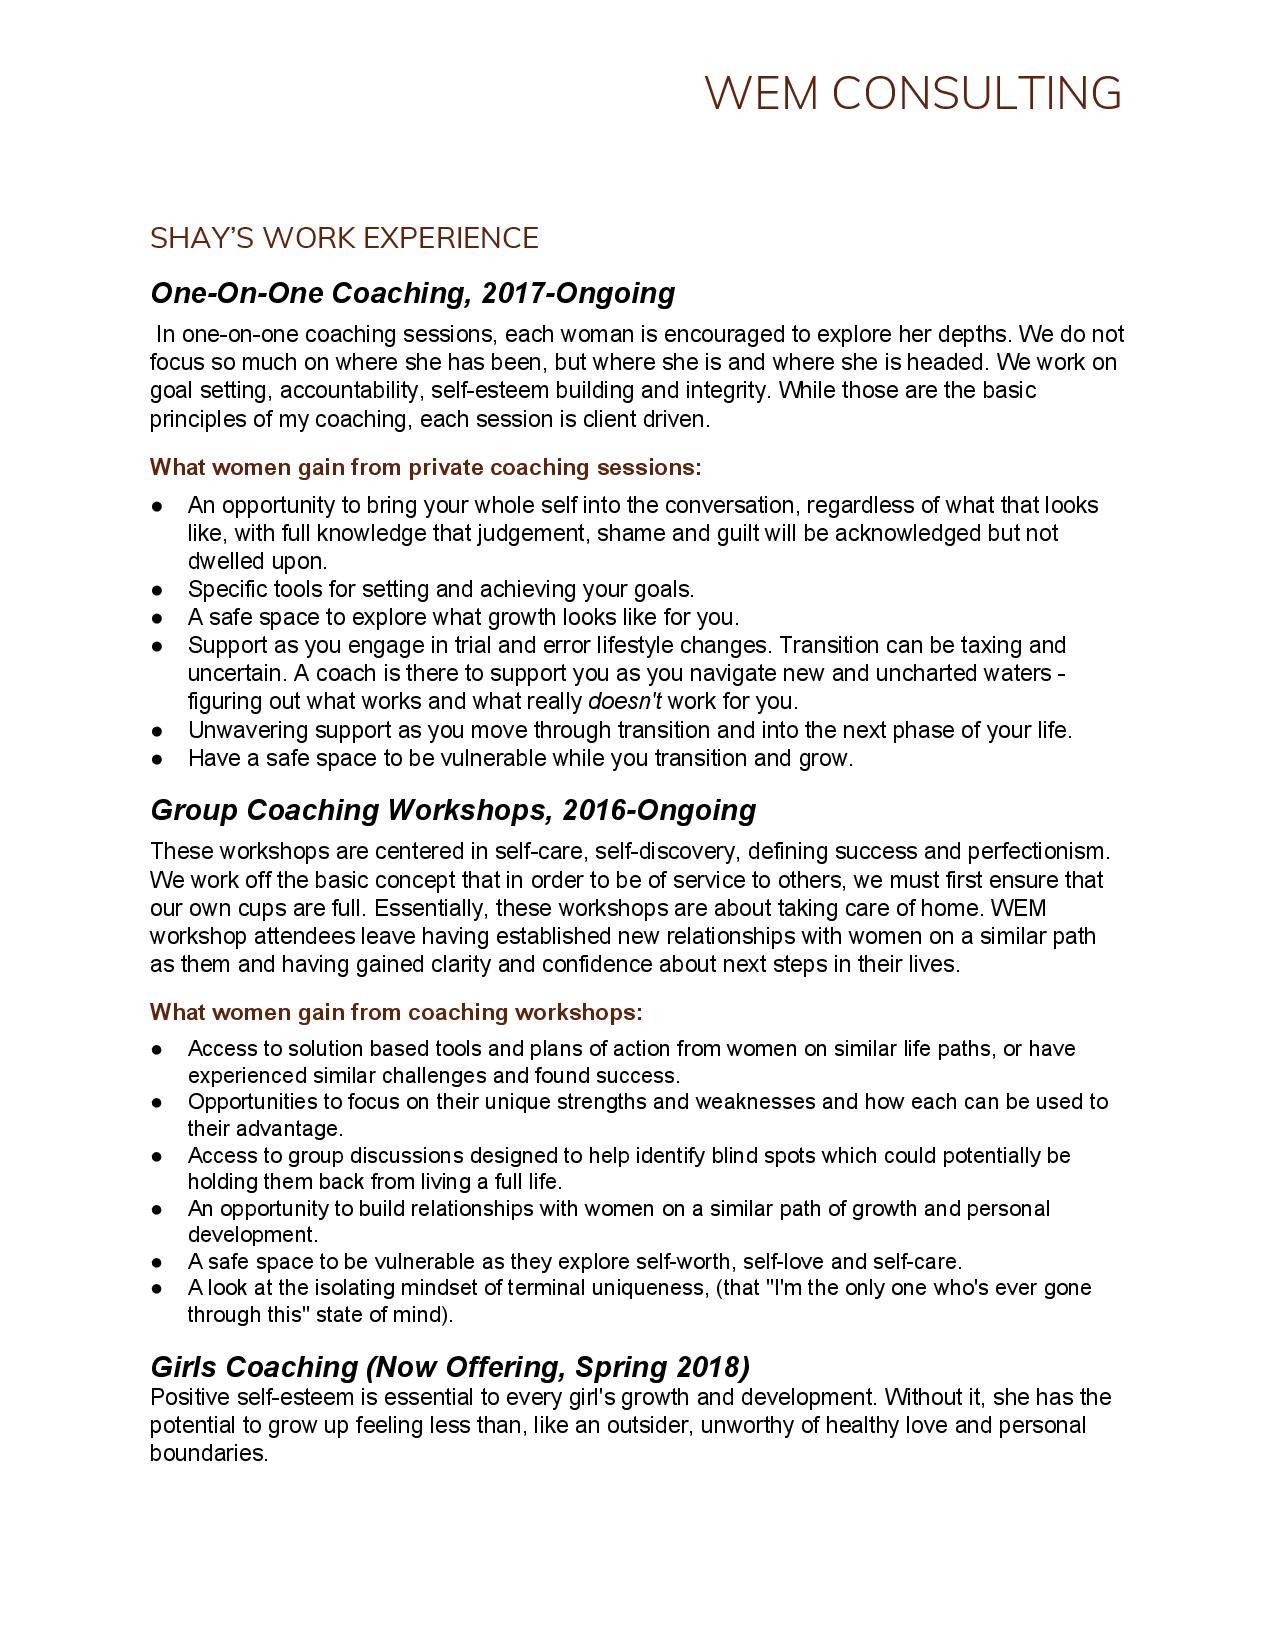 WEM Consulting Resume v4-06-2018 -page-2.jpg